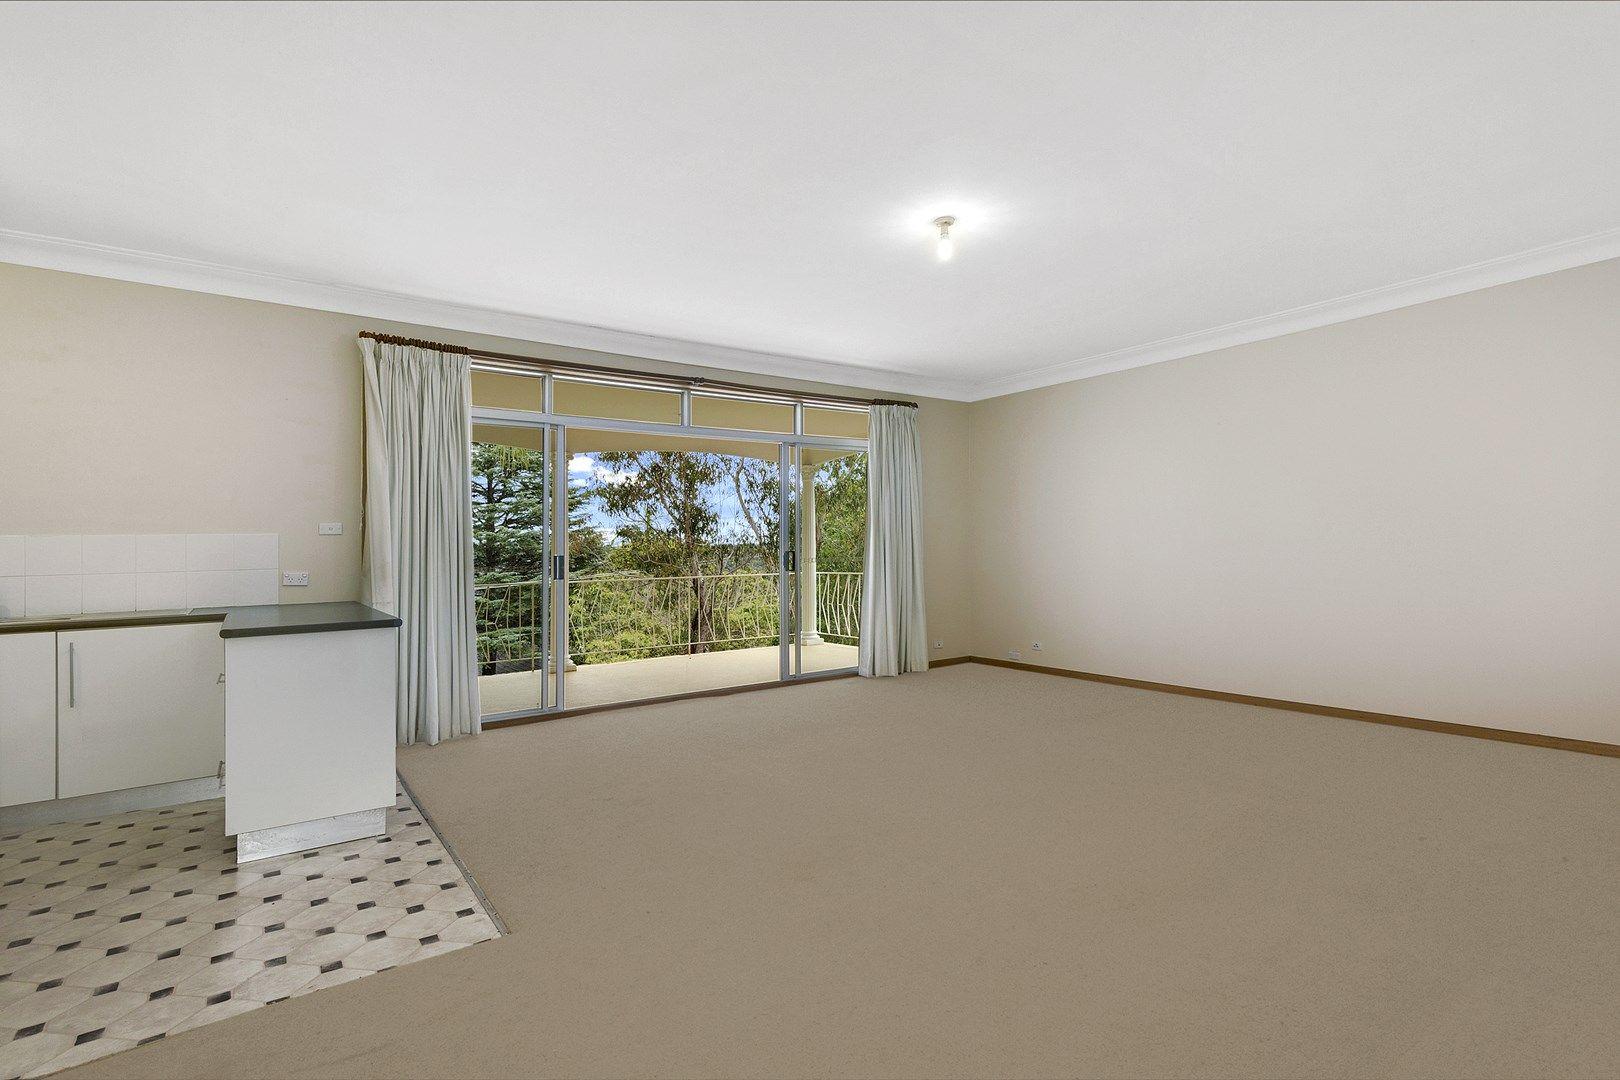 2/62 Ballyshannon Road, Killarney Heights NSW 2087, Image 0